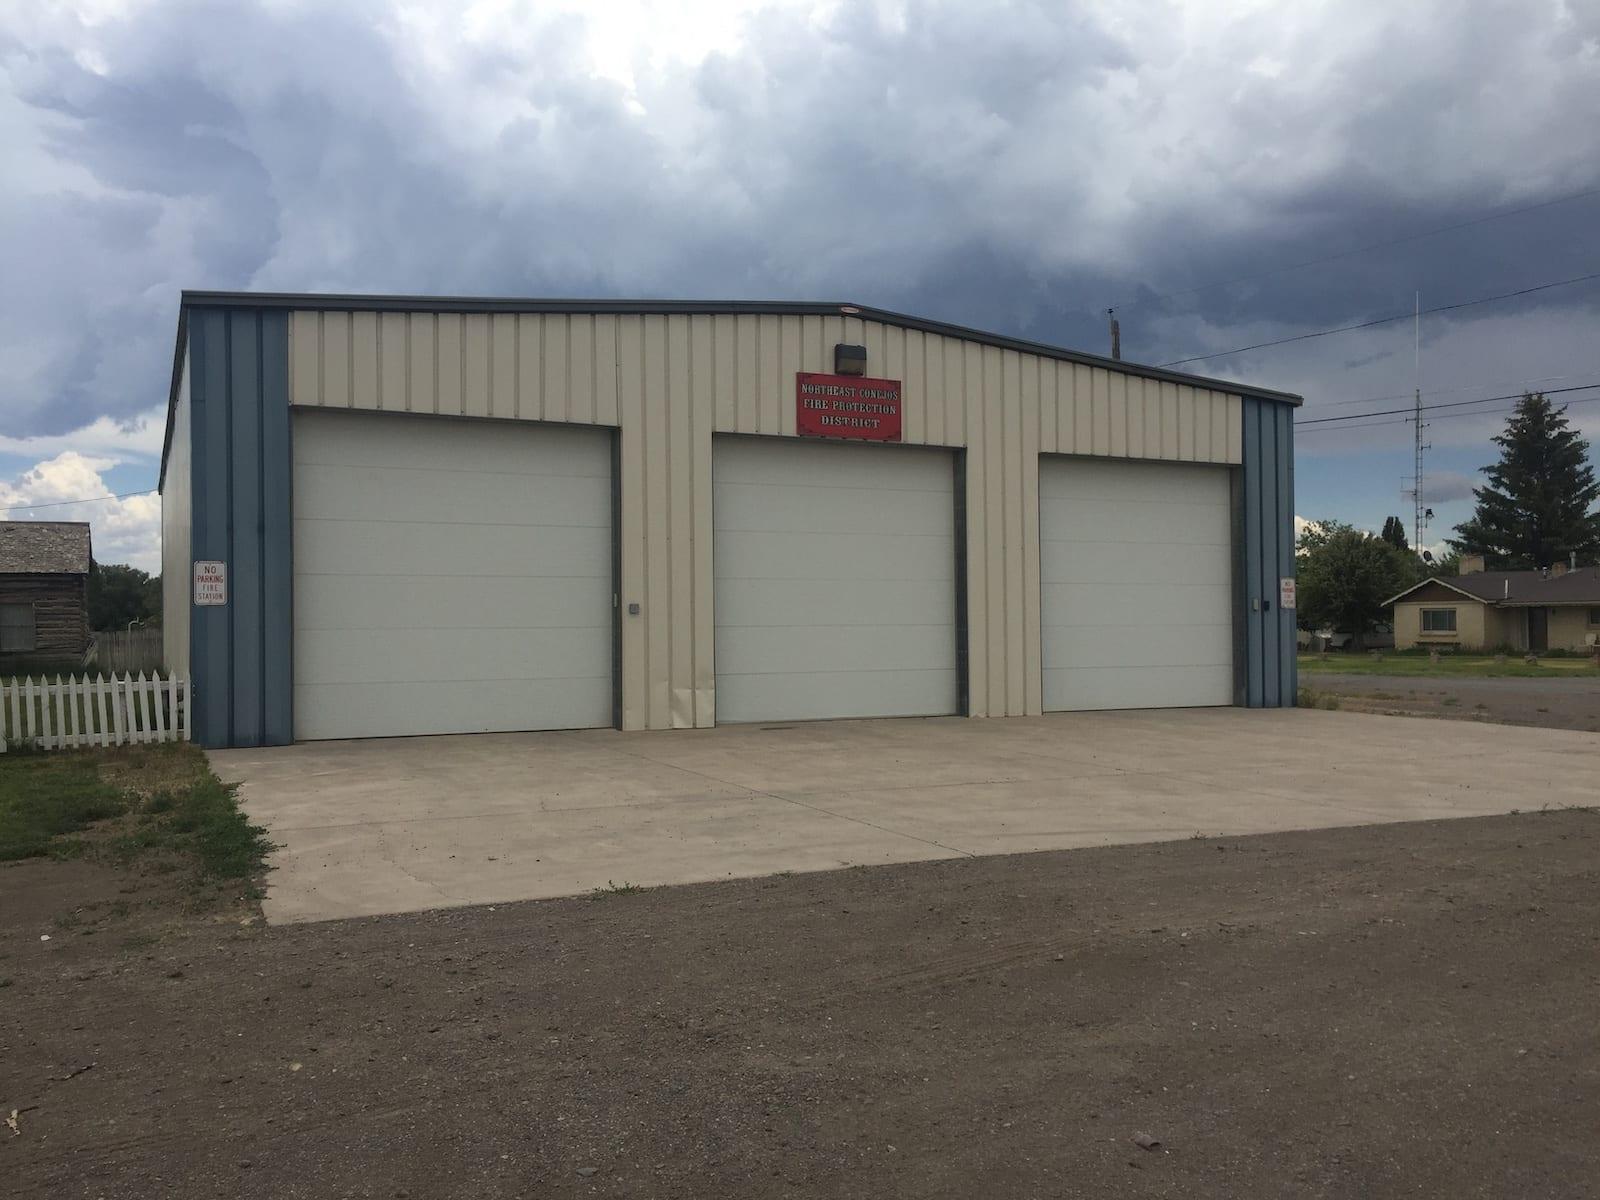 Sanford Colorado Northeast Conejos Fire Protection District